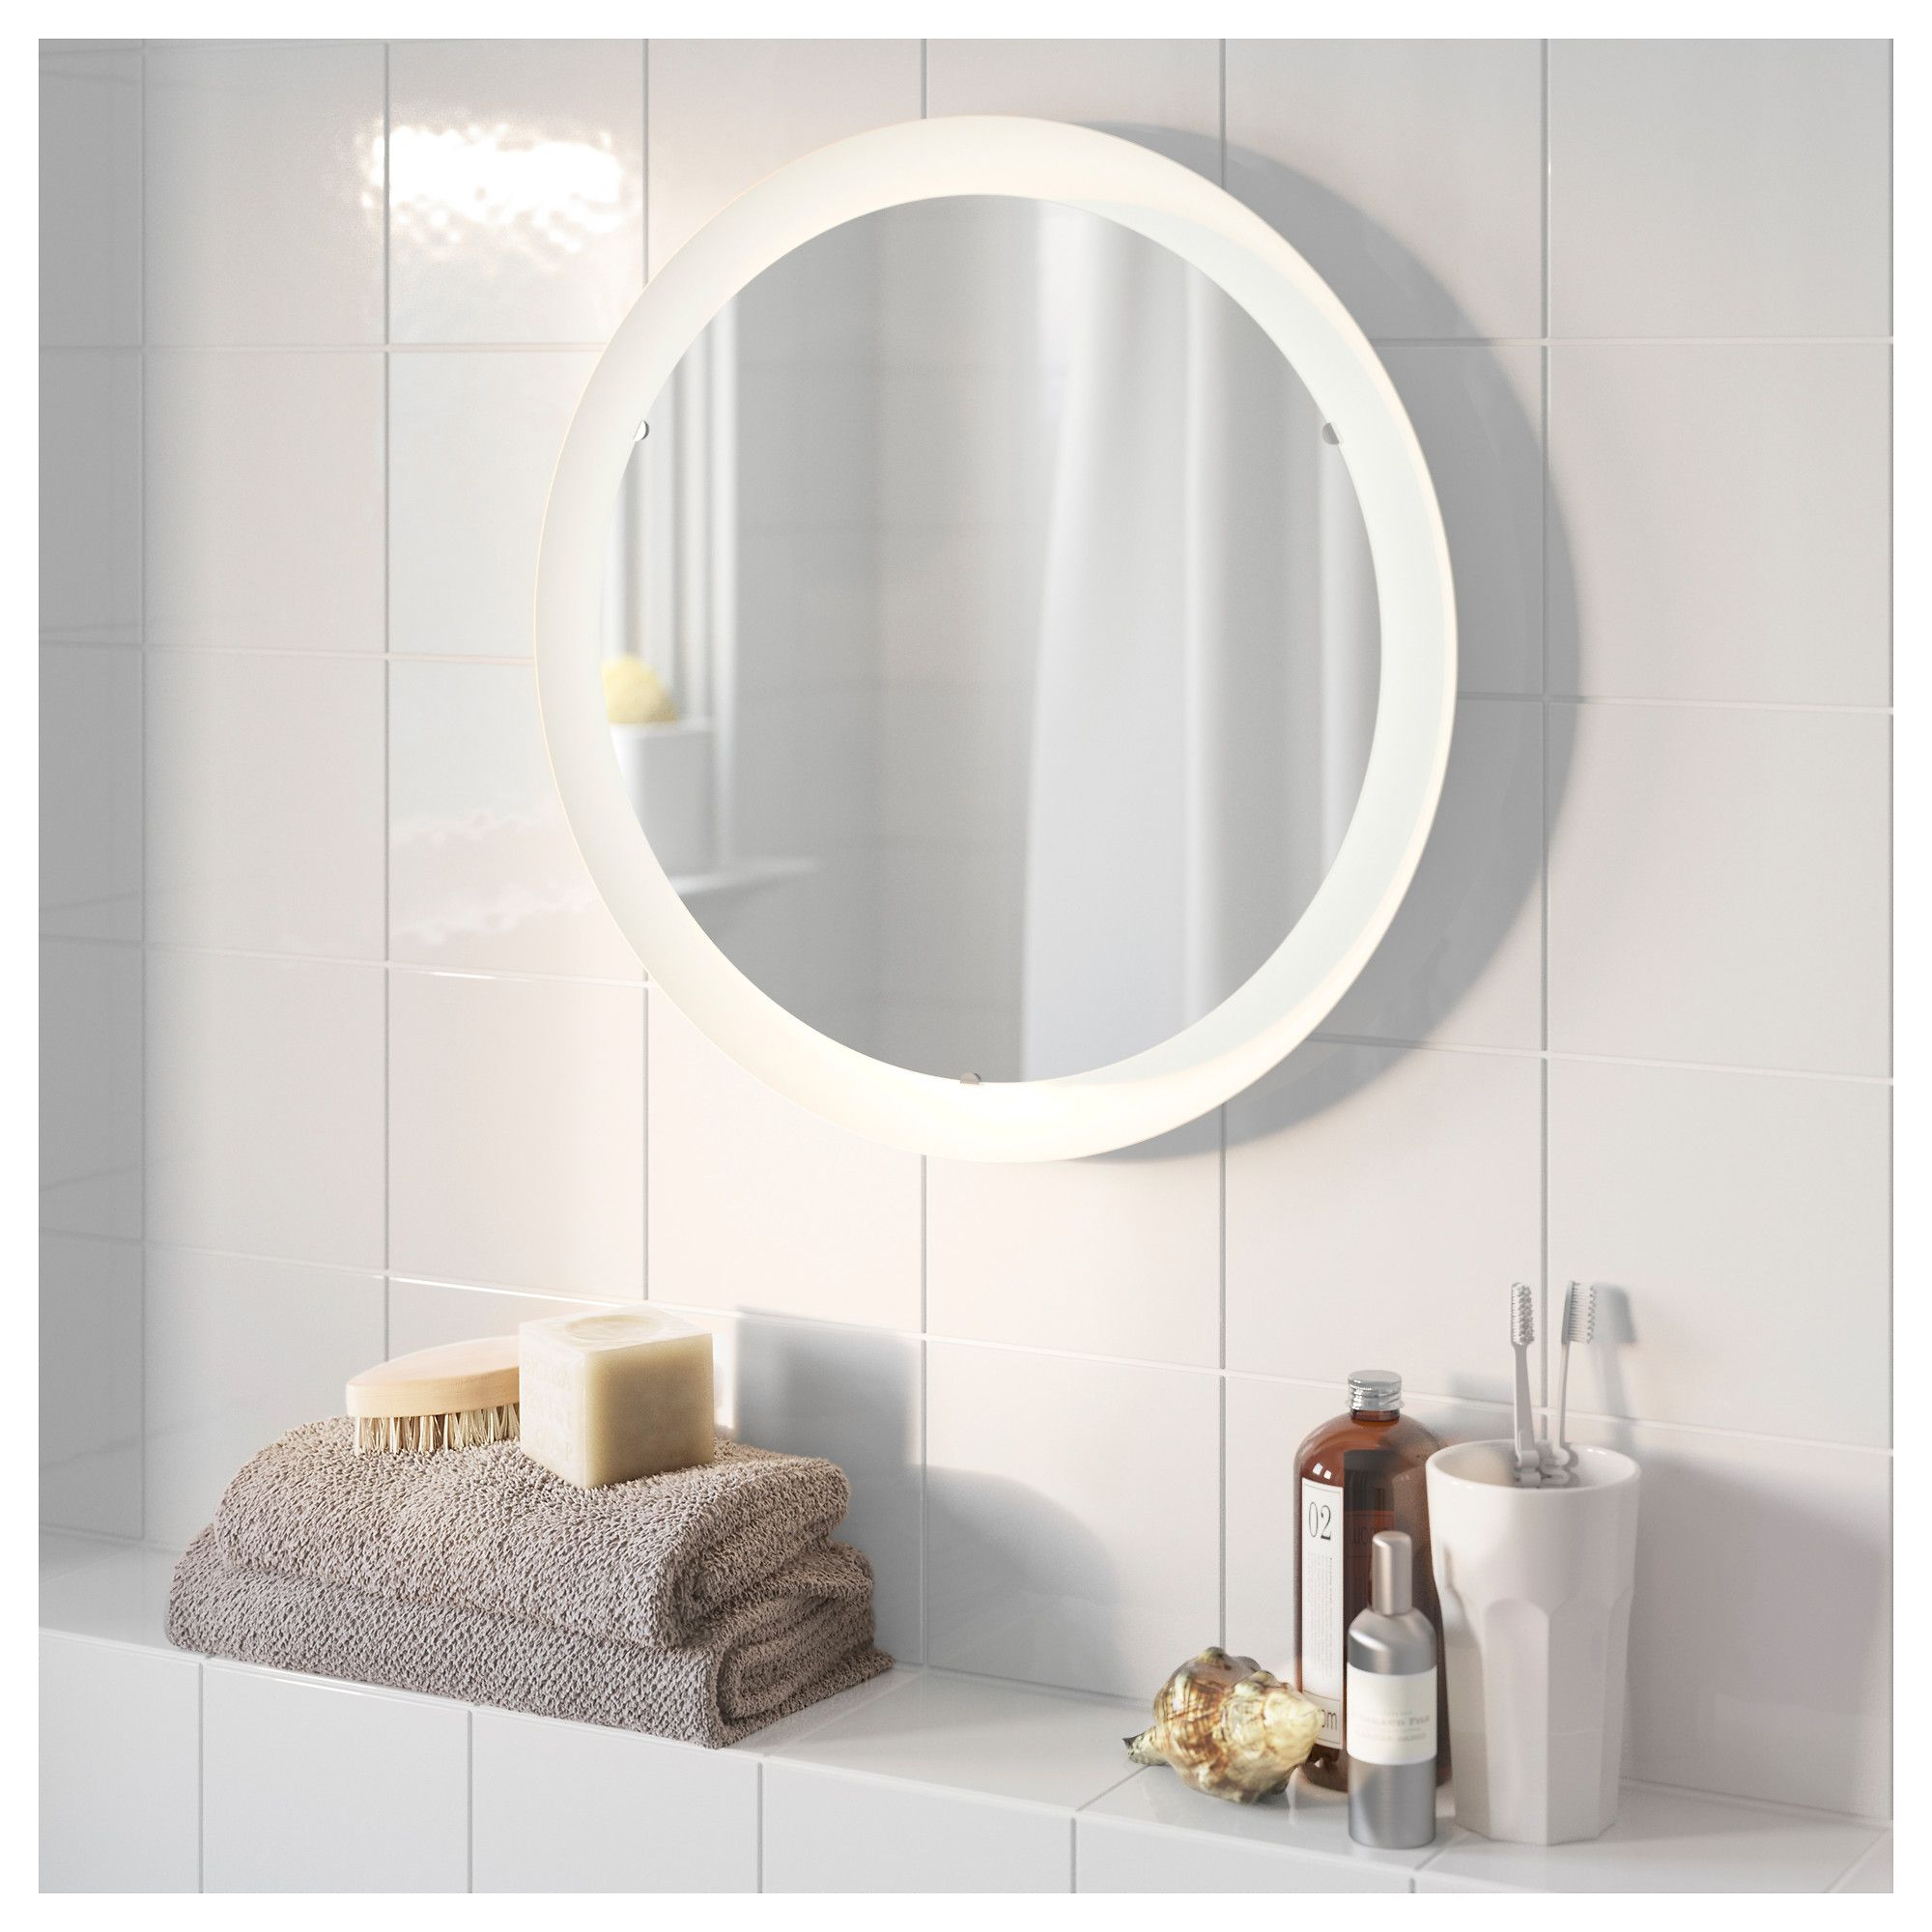 STORJORM Mirror with integrated lighting White IKEA | Bathroom ...